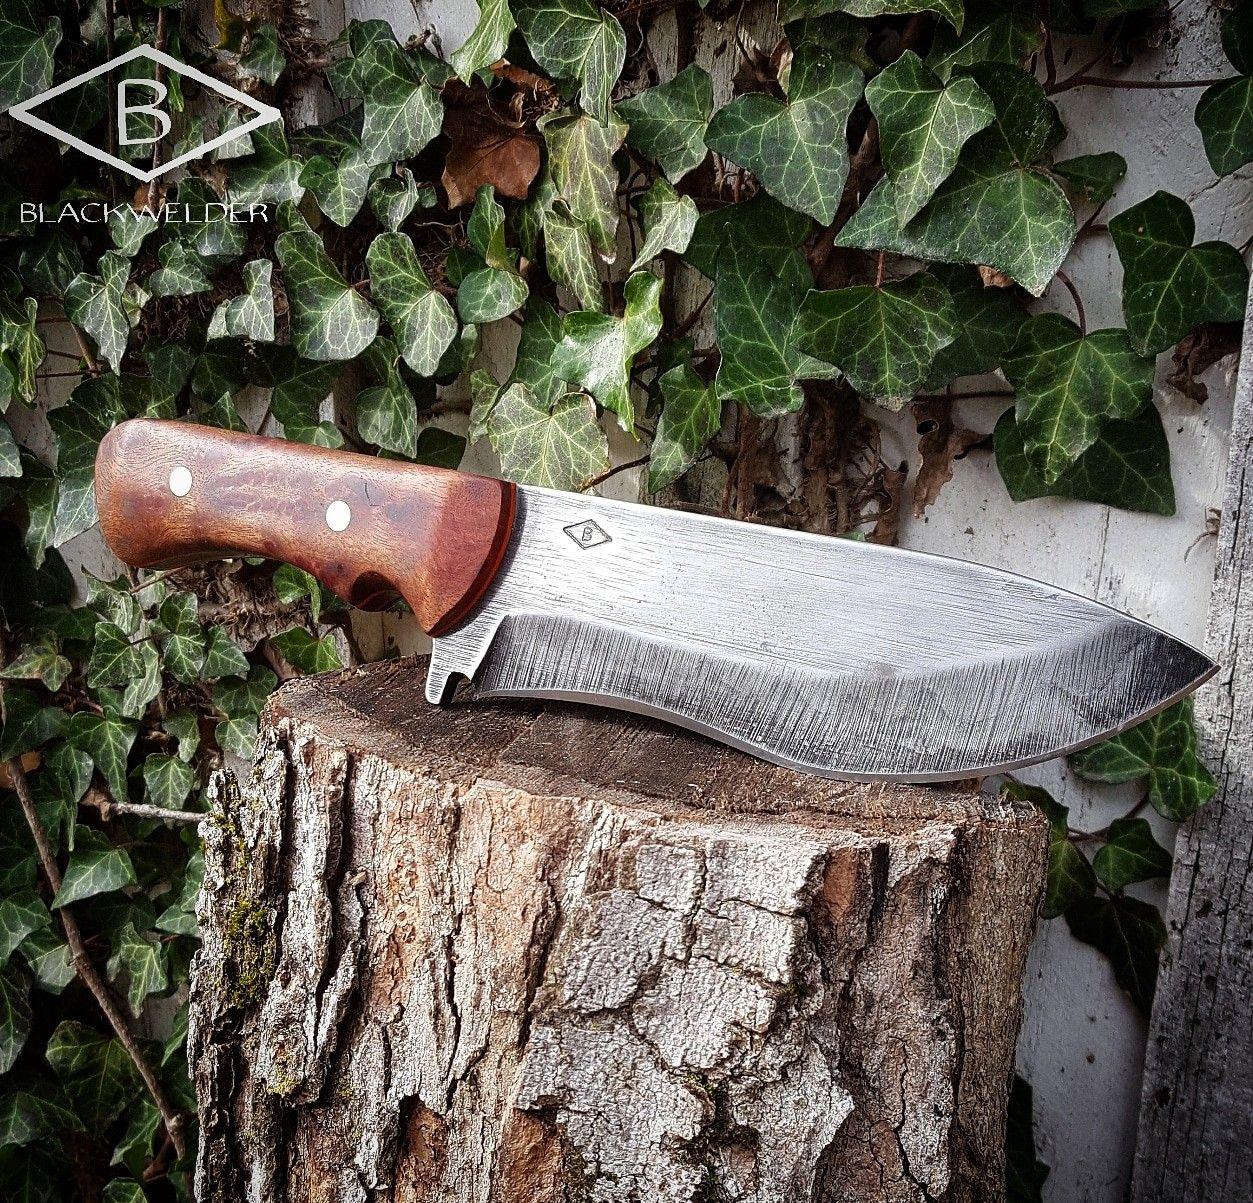 Hunter In 1084 Carbon Steel And Camphor Burl Handle By Blackwelder Knives Knife Knife Making Custom Knives